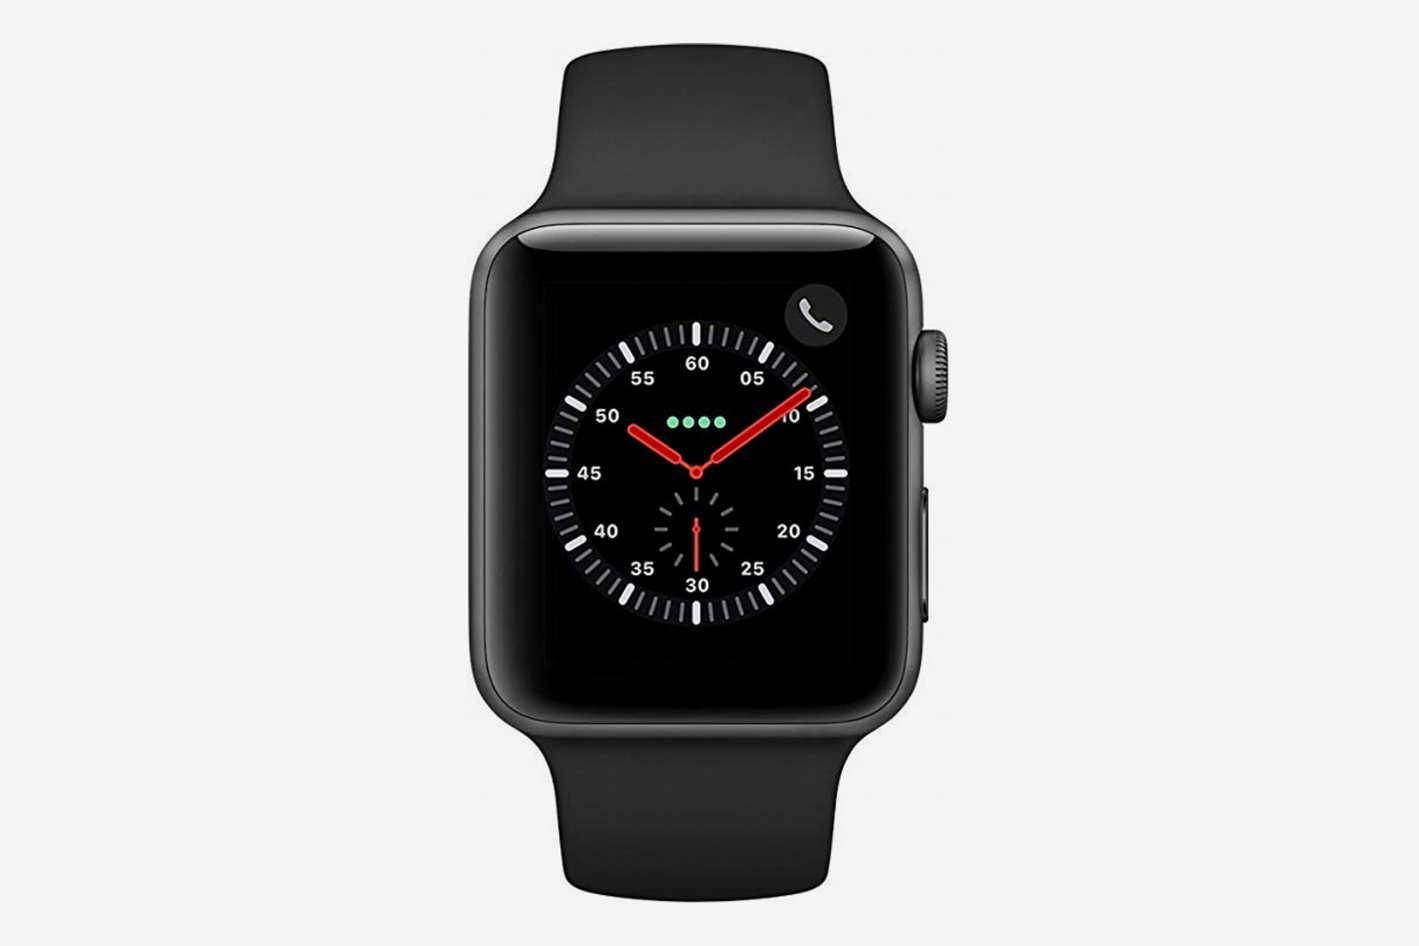 AppleWatch Series3 (GPS+Cellular, 42mm)